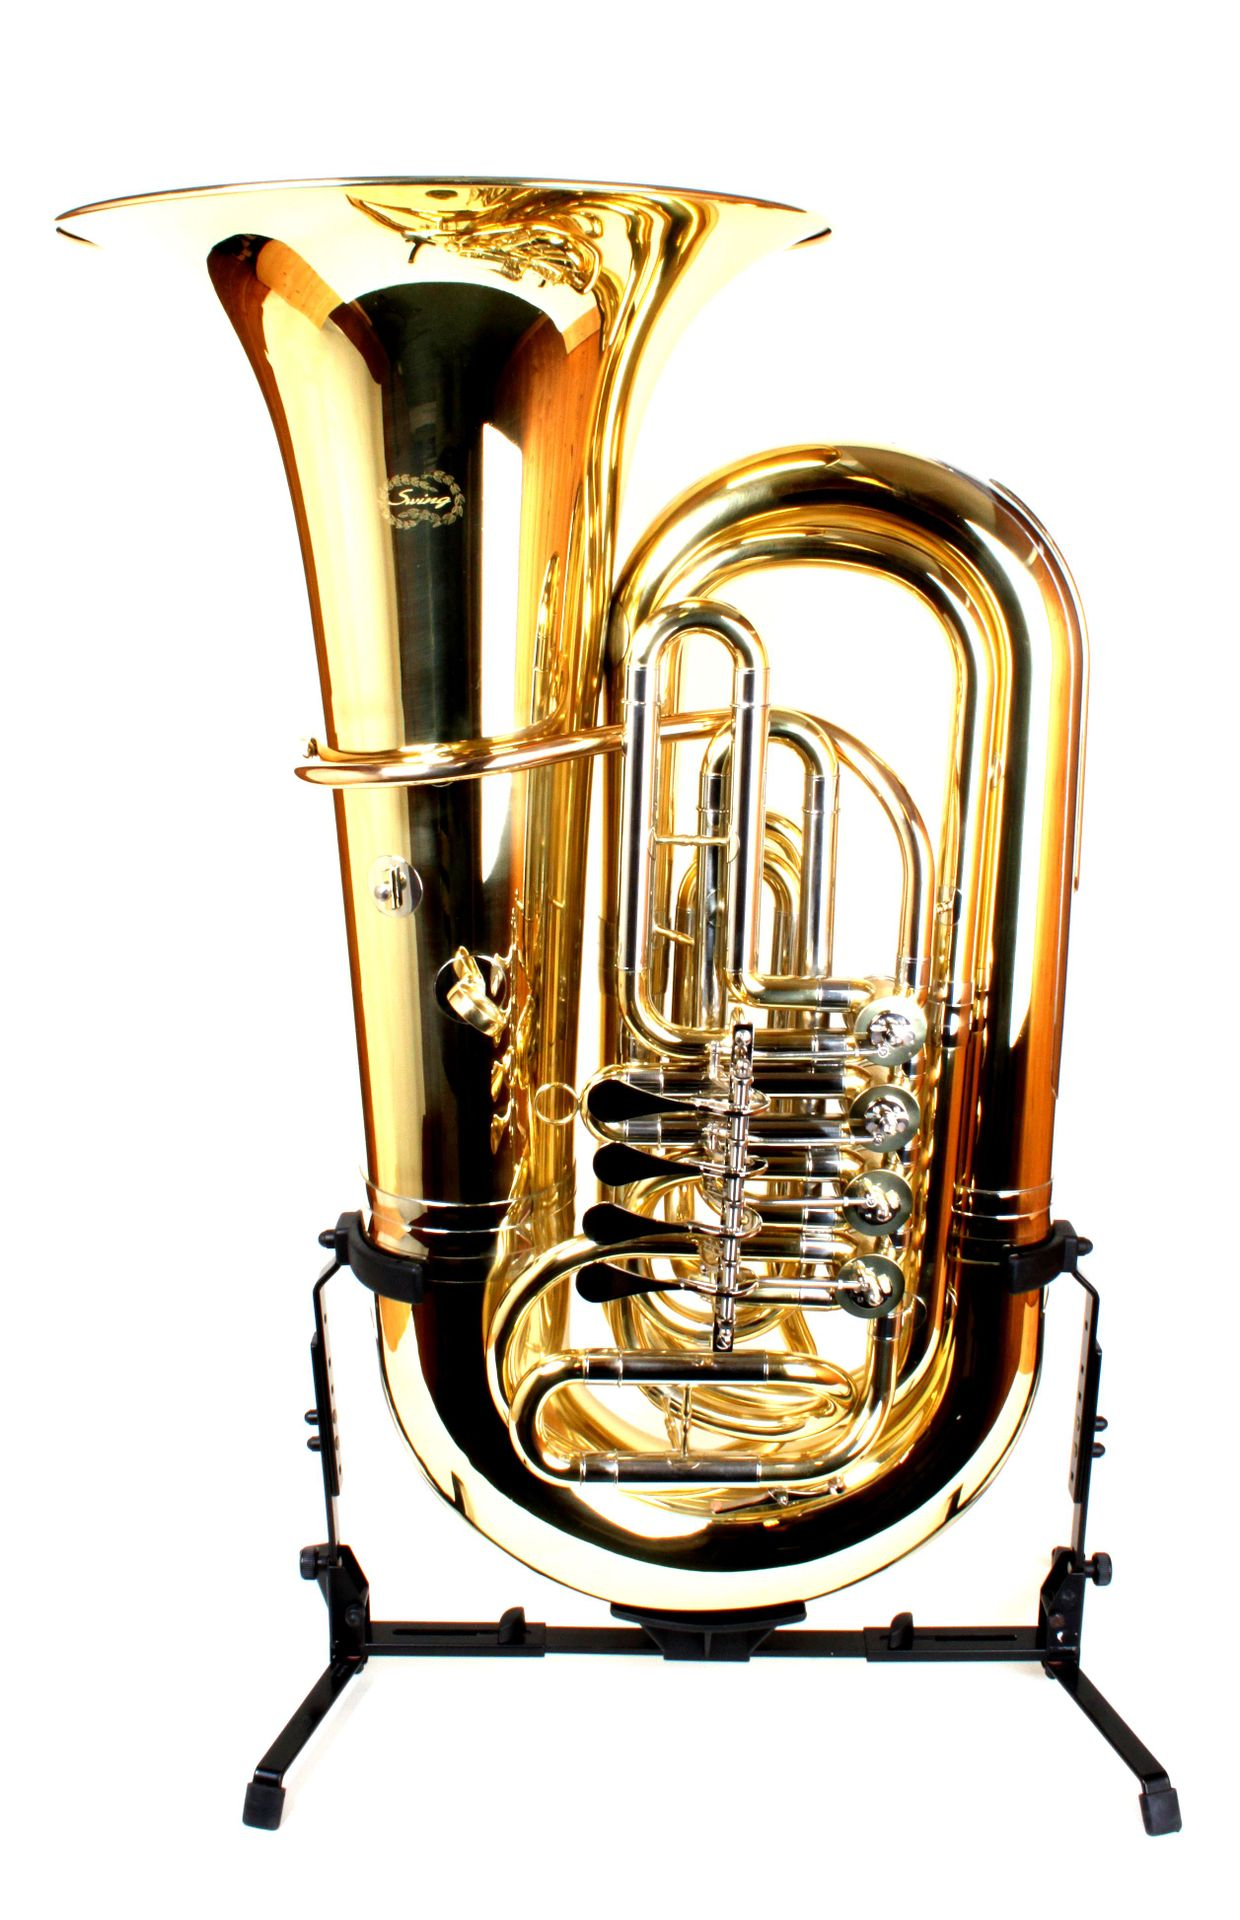 SWING Tuba TU-205, Bb-Tuba 4 Ventile, 19,00 mm Bohrung, 45cm Schallstück,Länge